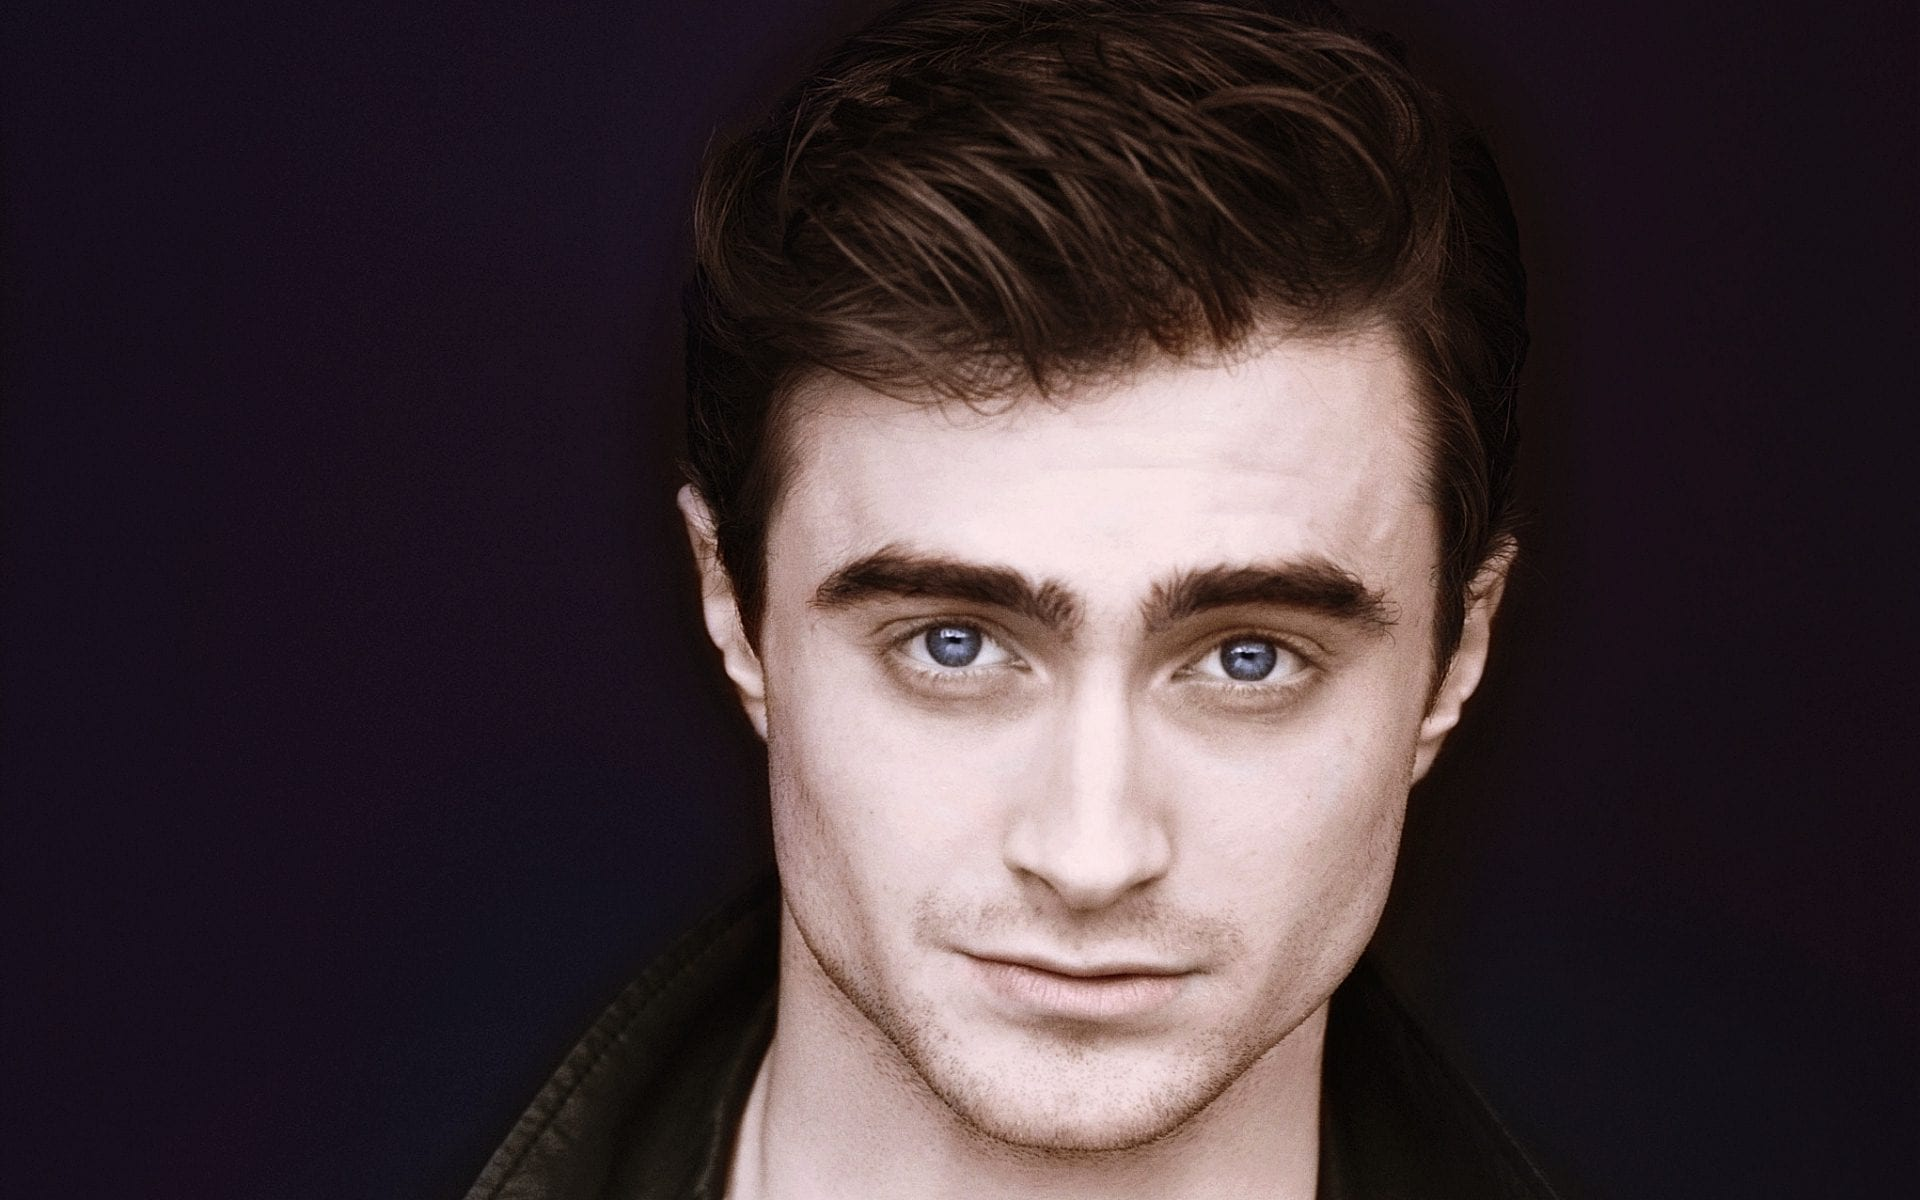 Daniel Radcliffe widescreen wallpapers